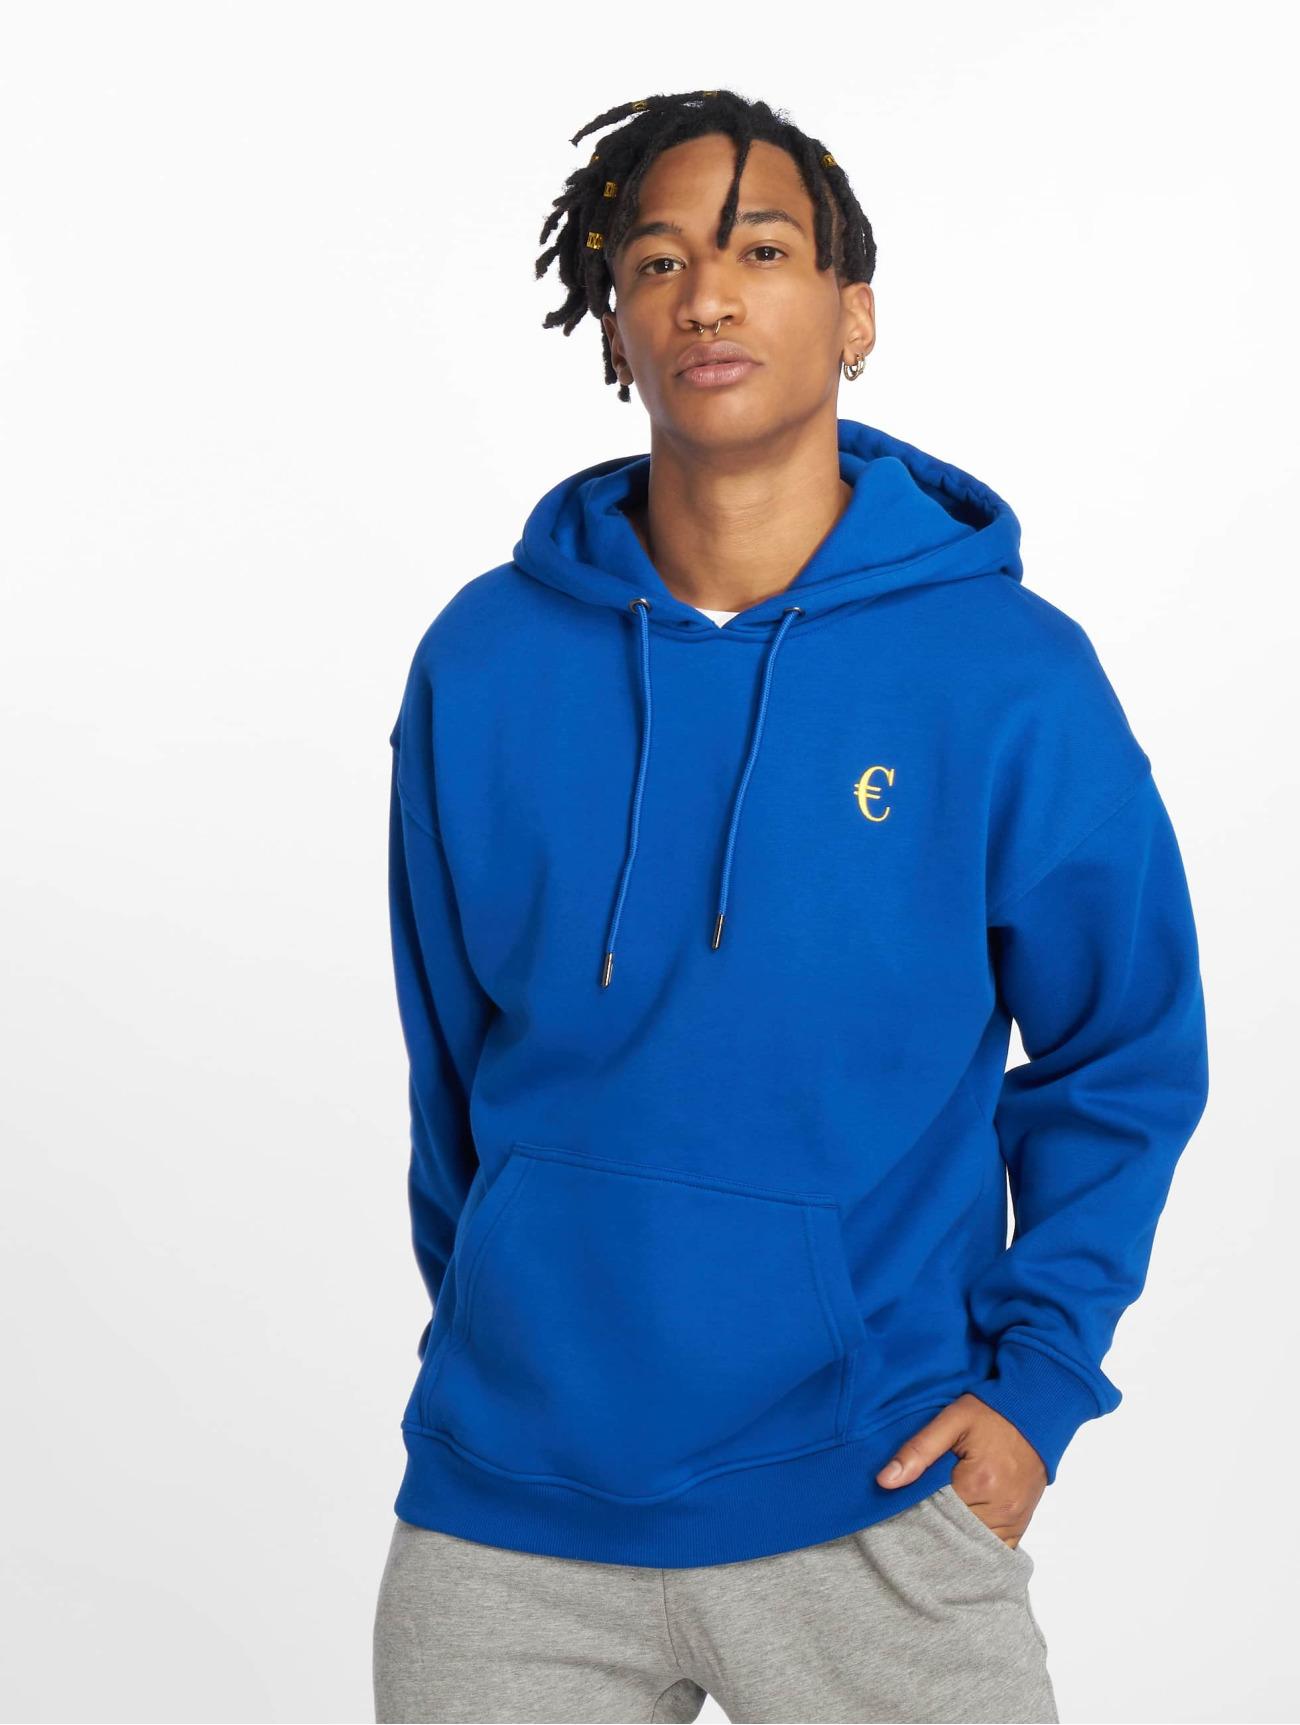 Mister Tee | Europe  bleu Homme Sweat capuche  543230| Homme Hauts